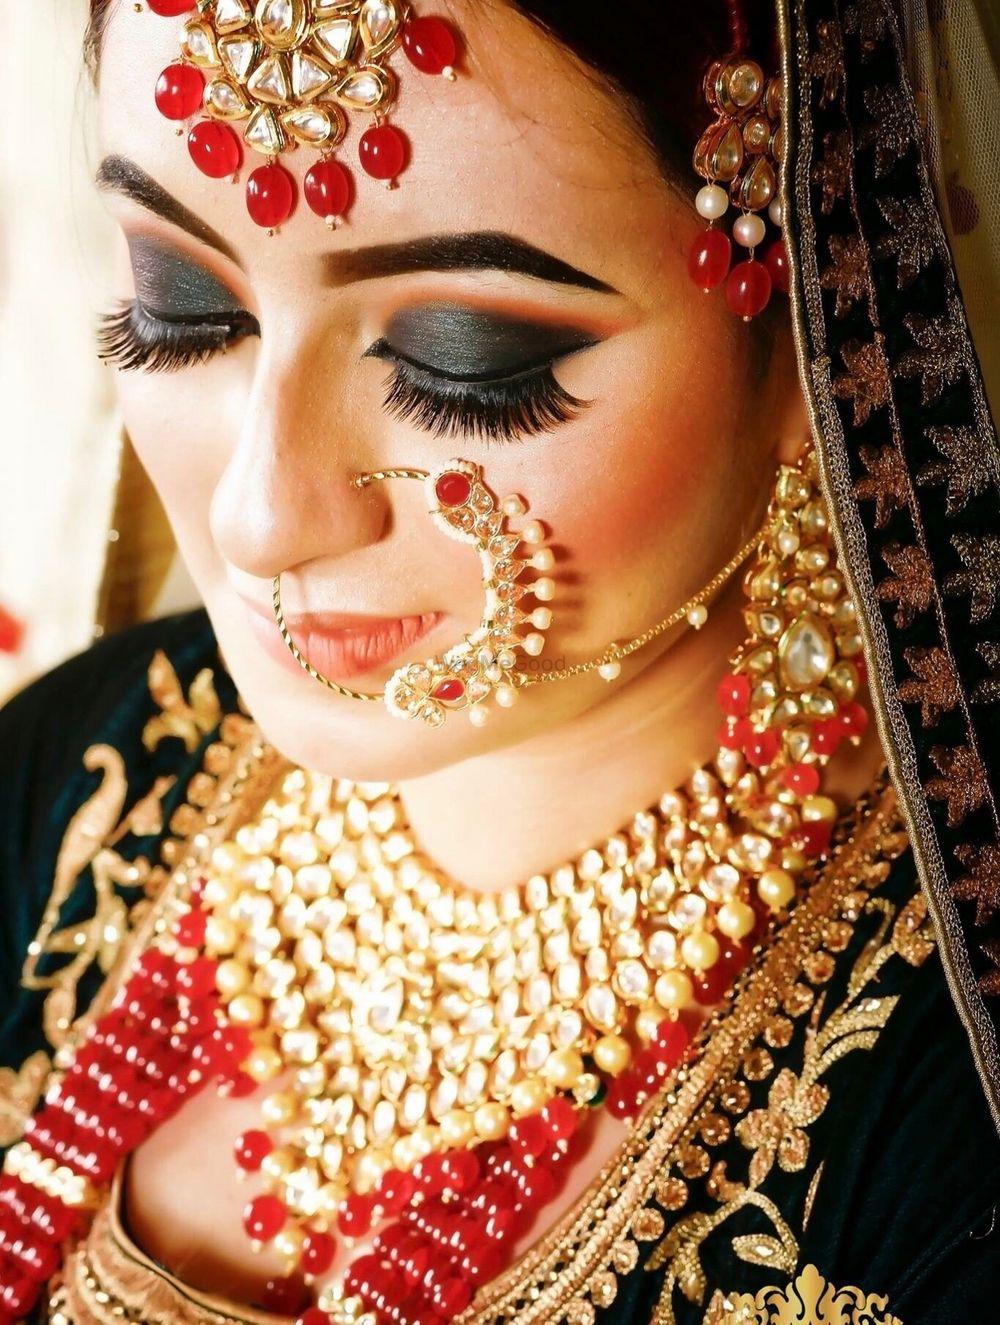 Photo By Makeup Mistress - Makeup Artist